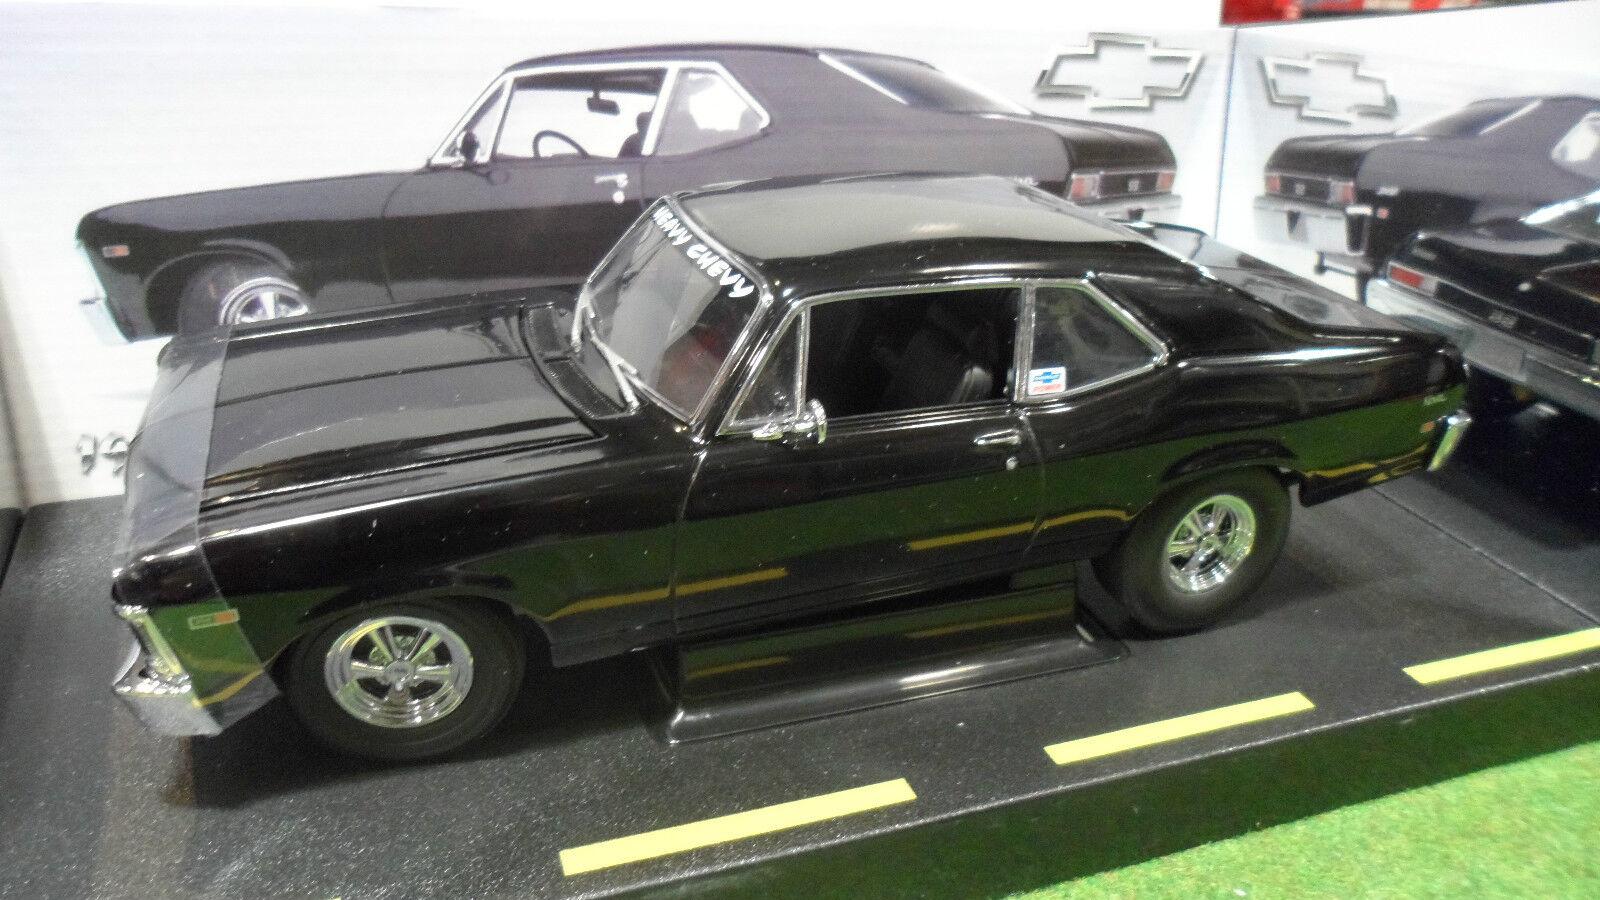 CHEVROLET NOVA SS 396 PRO STREET 1968 1 18 GMP 8025 voiture miniature collection